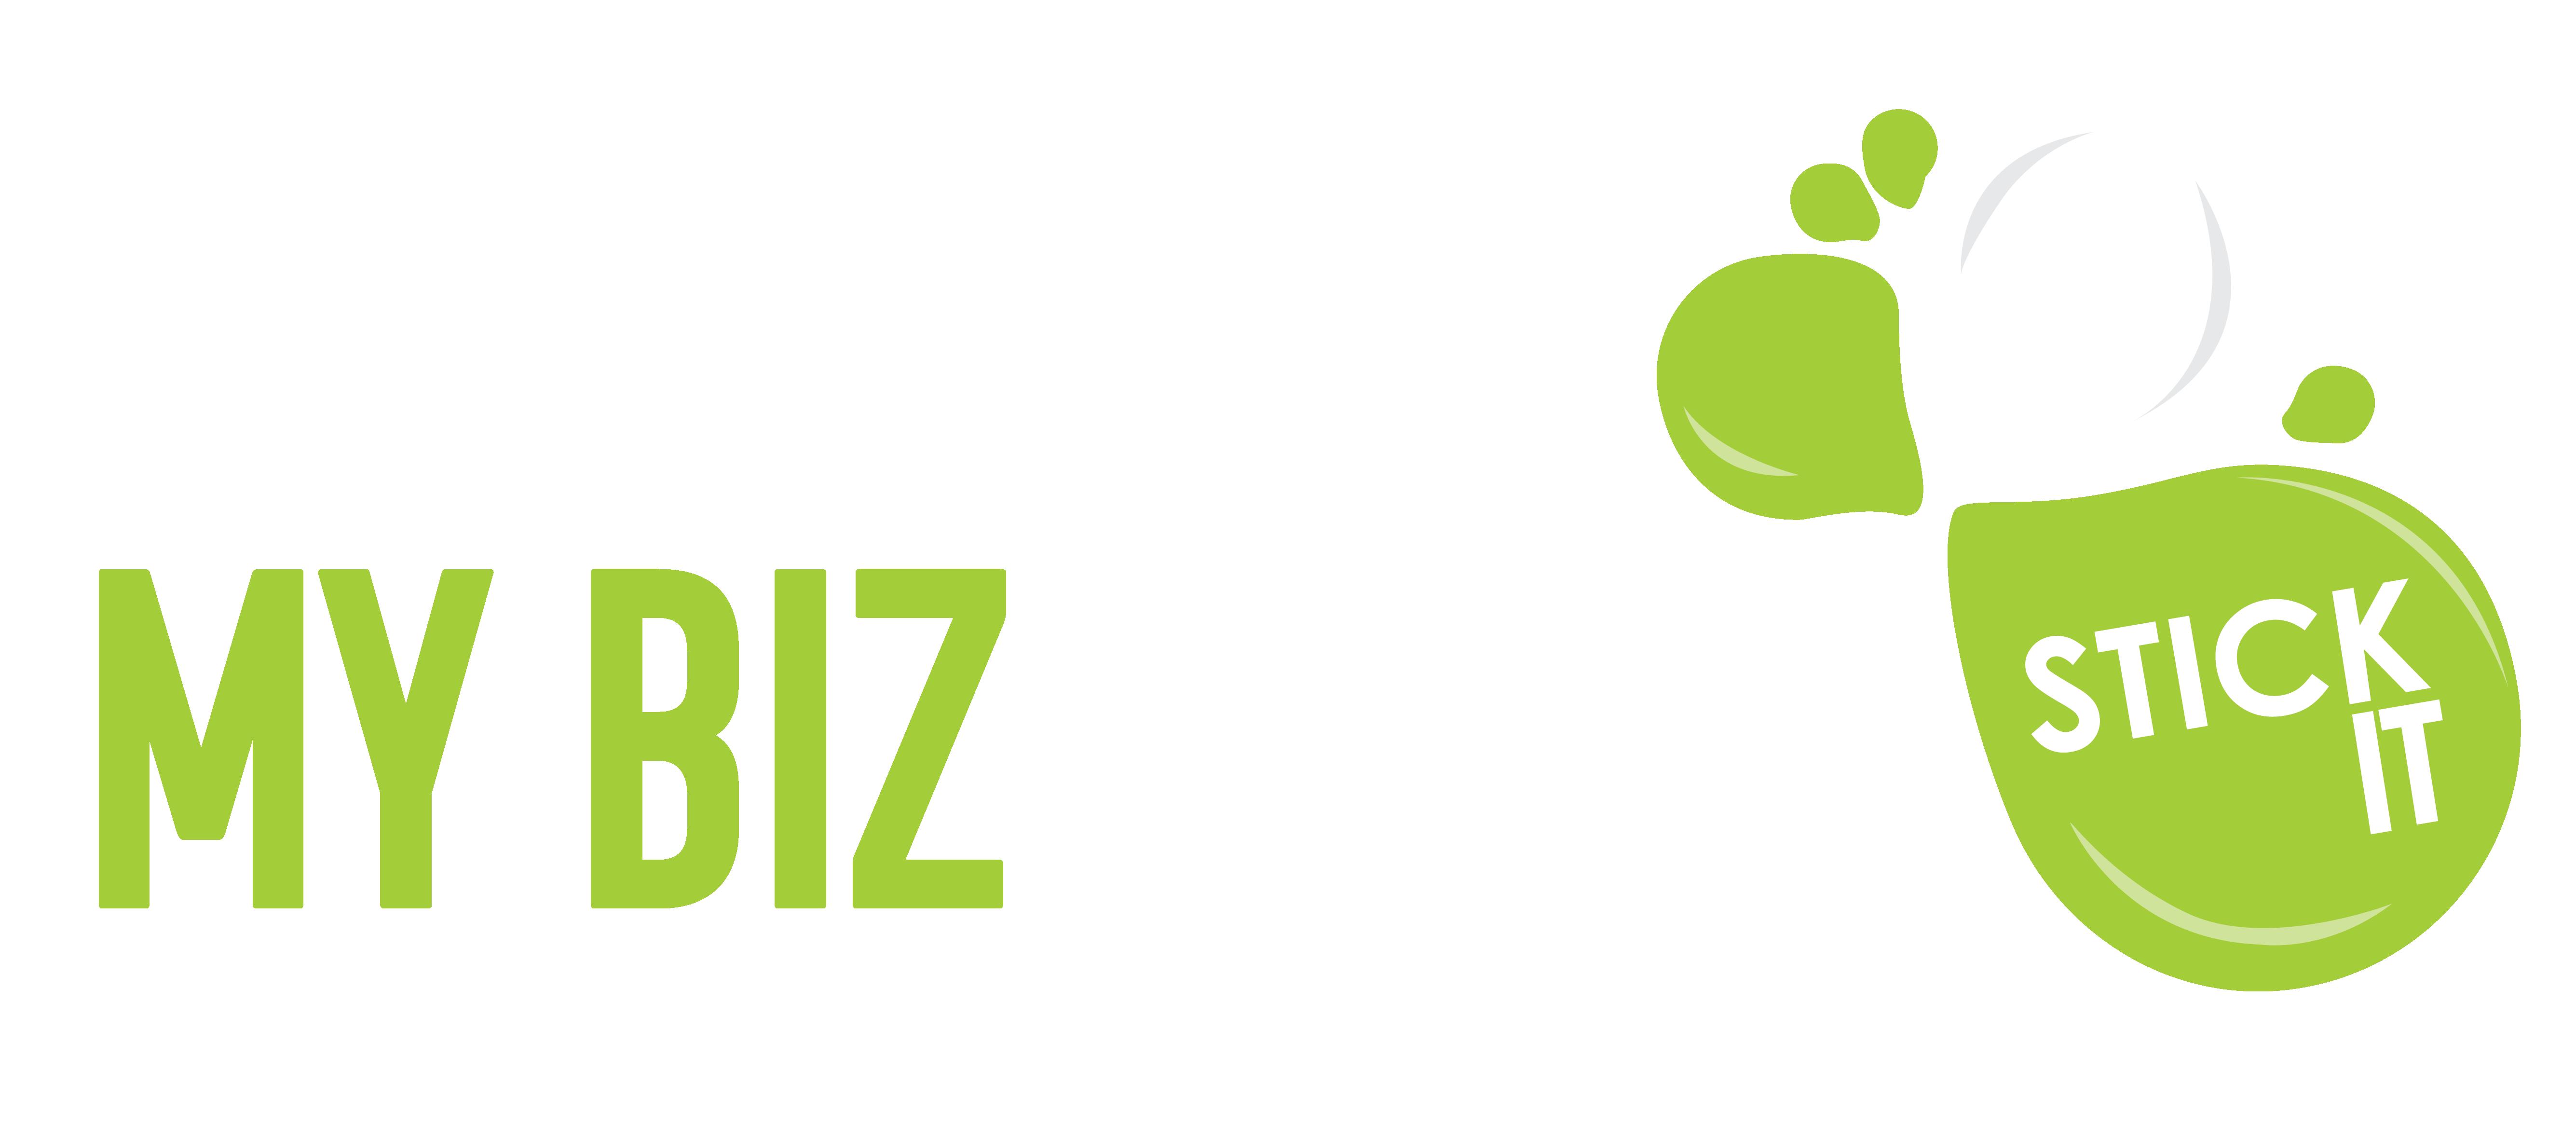 My Biz Media_Stick it_Final-24